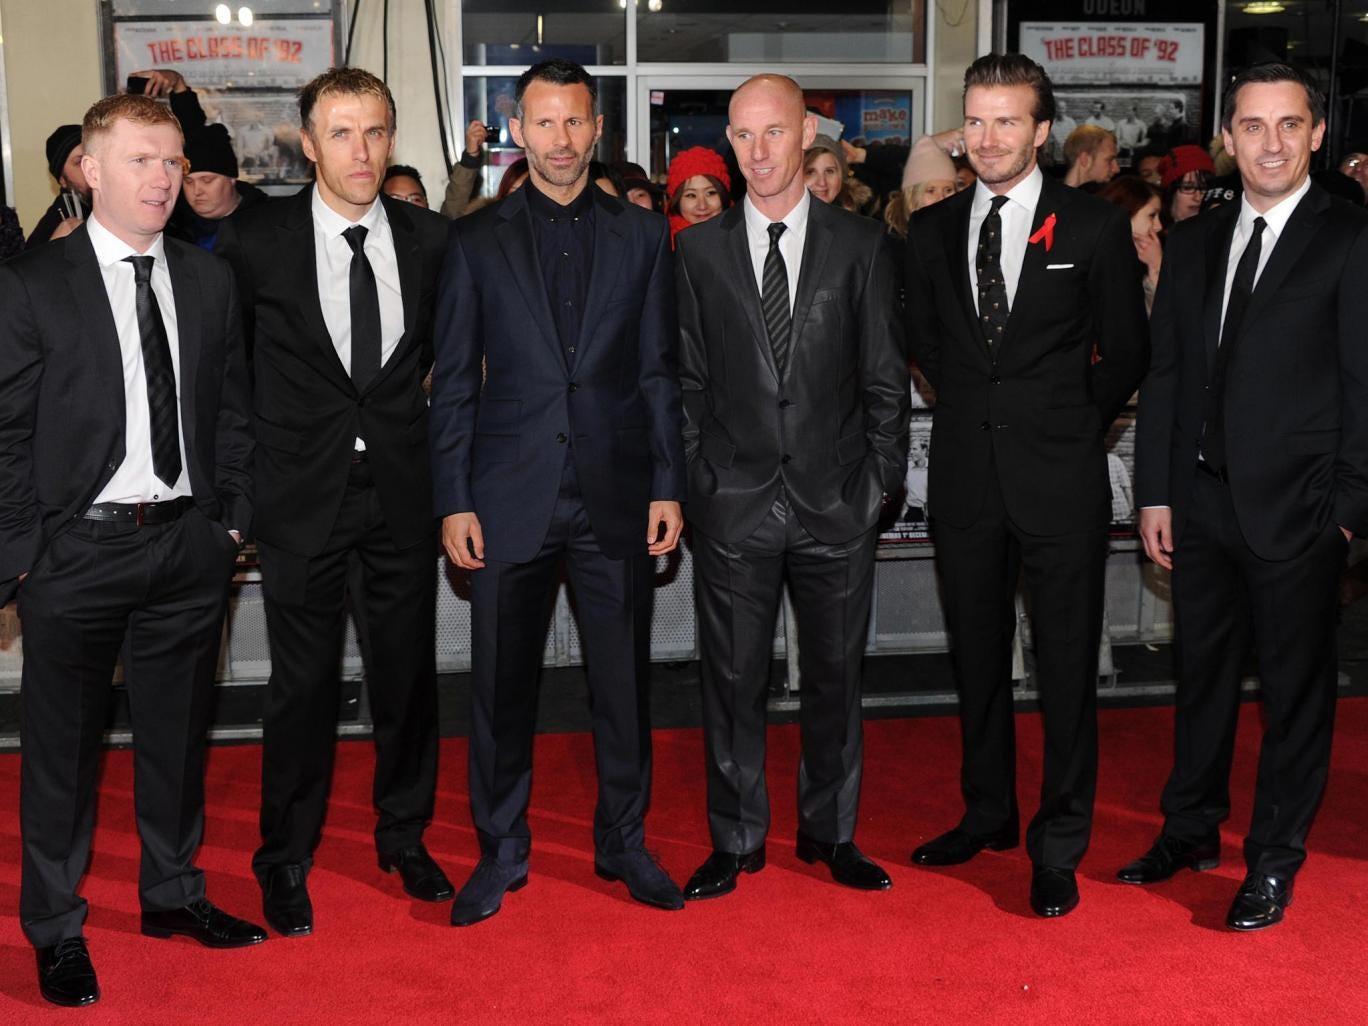 (L-R) Paul Scholes, Phil Neville, Ryan Giggs, Nicky Butt, David Beckham and Gary Neville